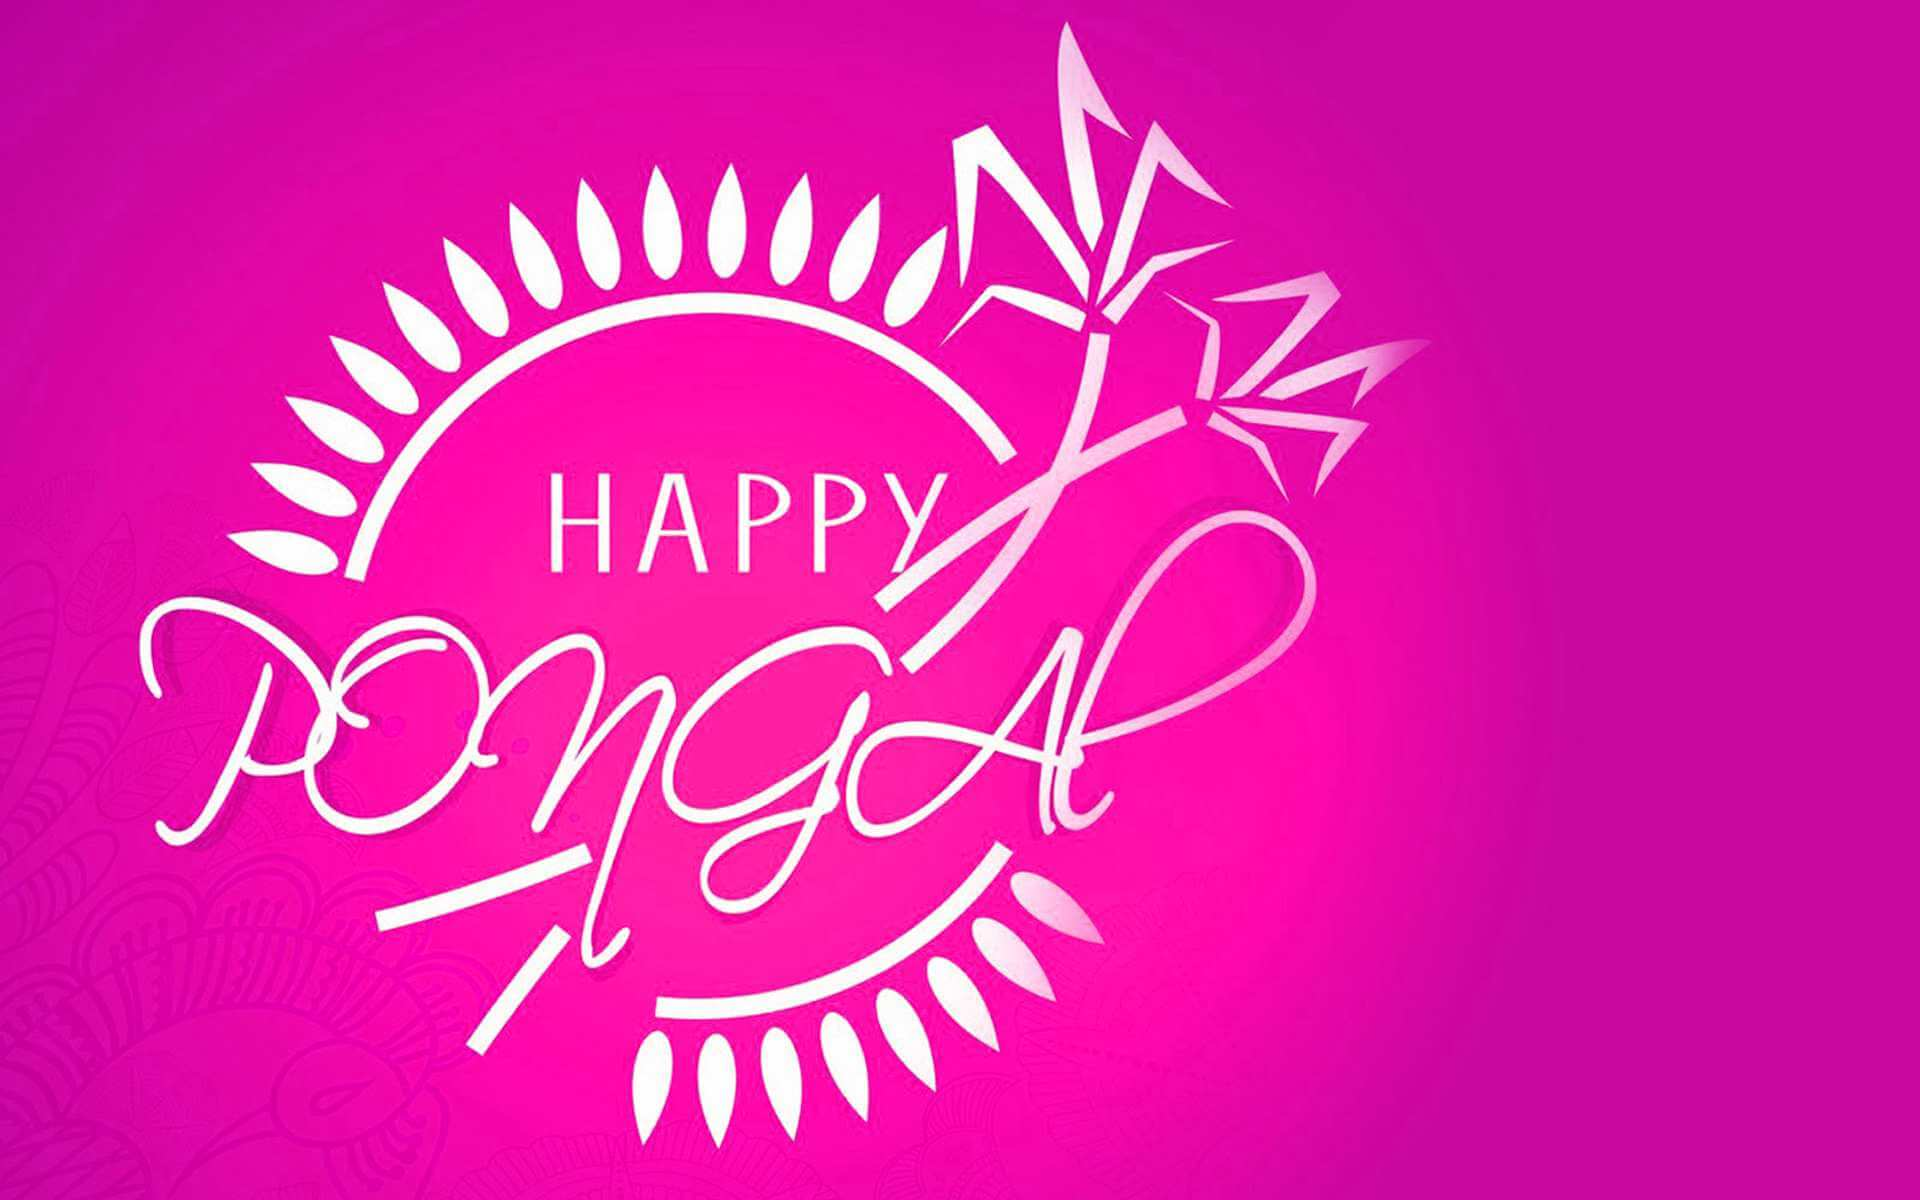 happy pongal pc hd wallpaper